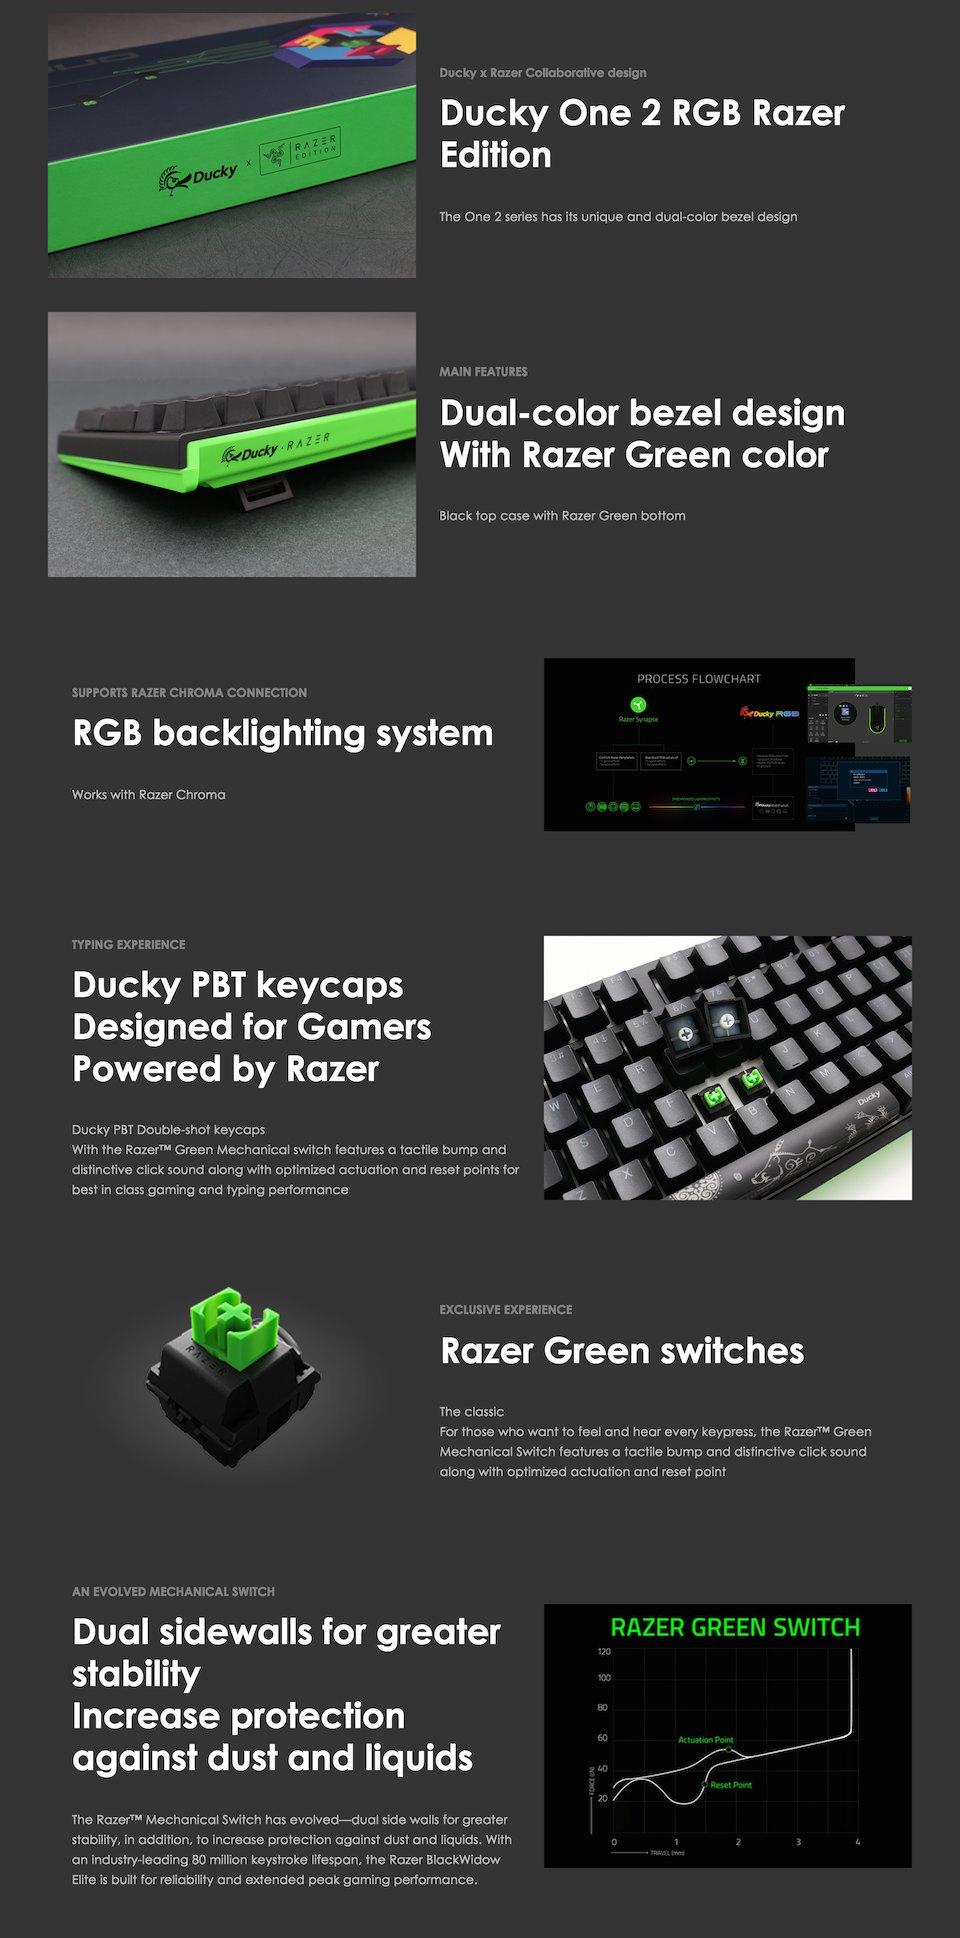 Ducky One 2 Razer Edition RGB Mechanical Keyboard Green features 2